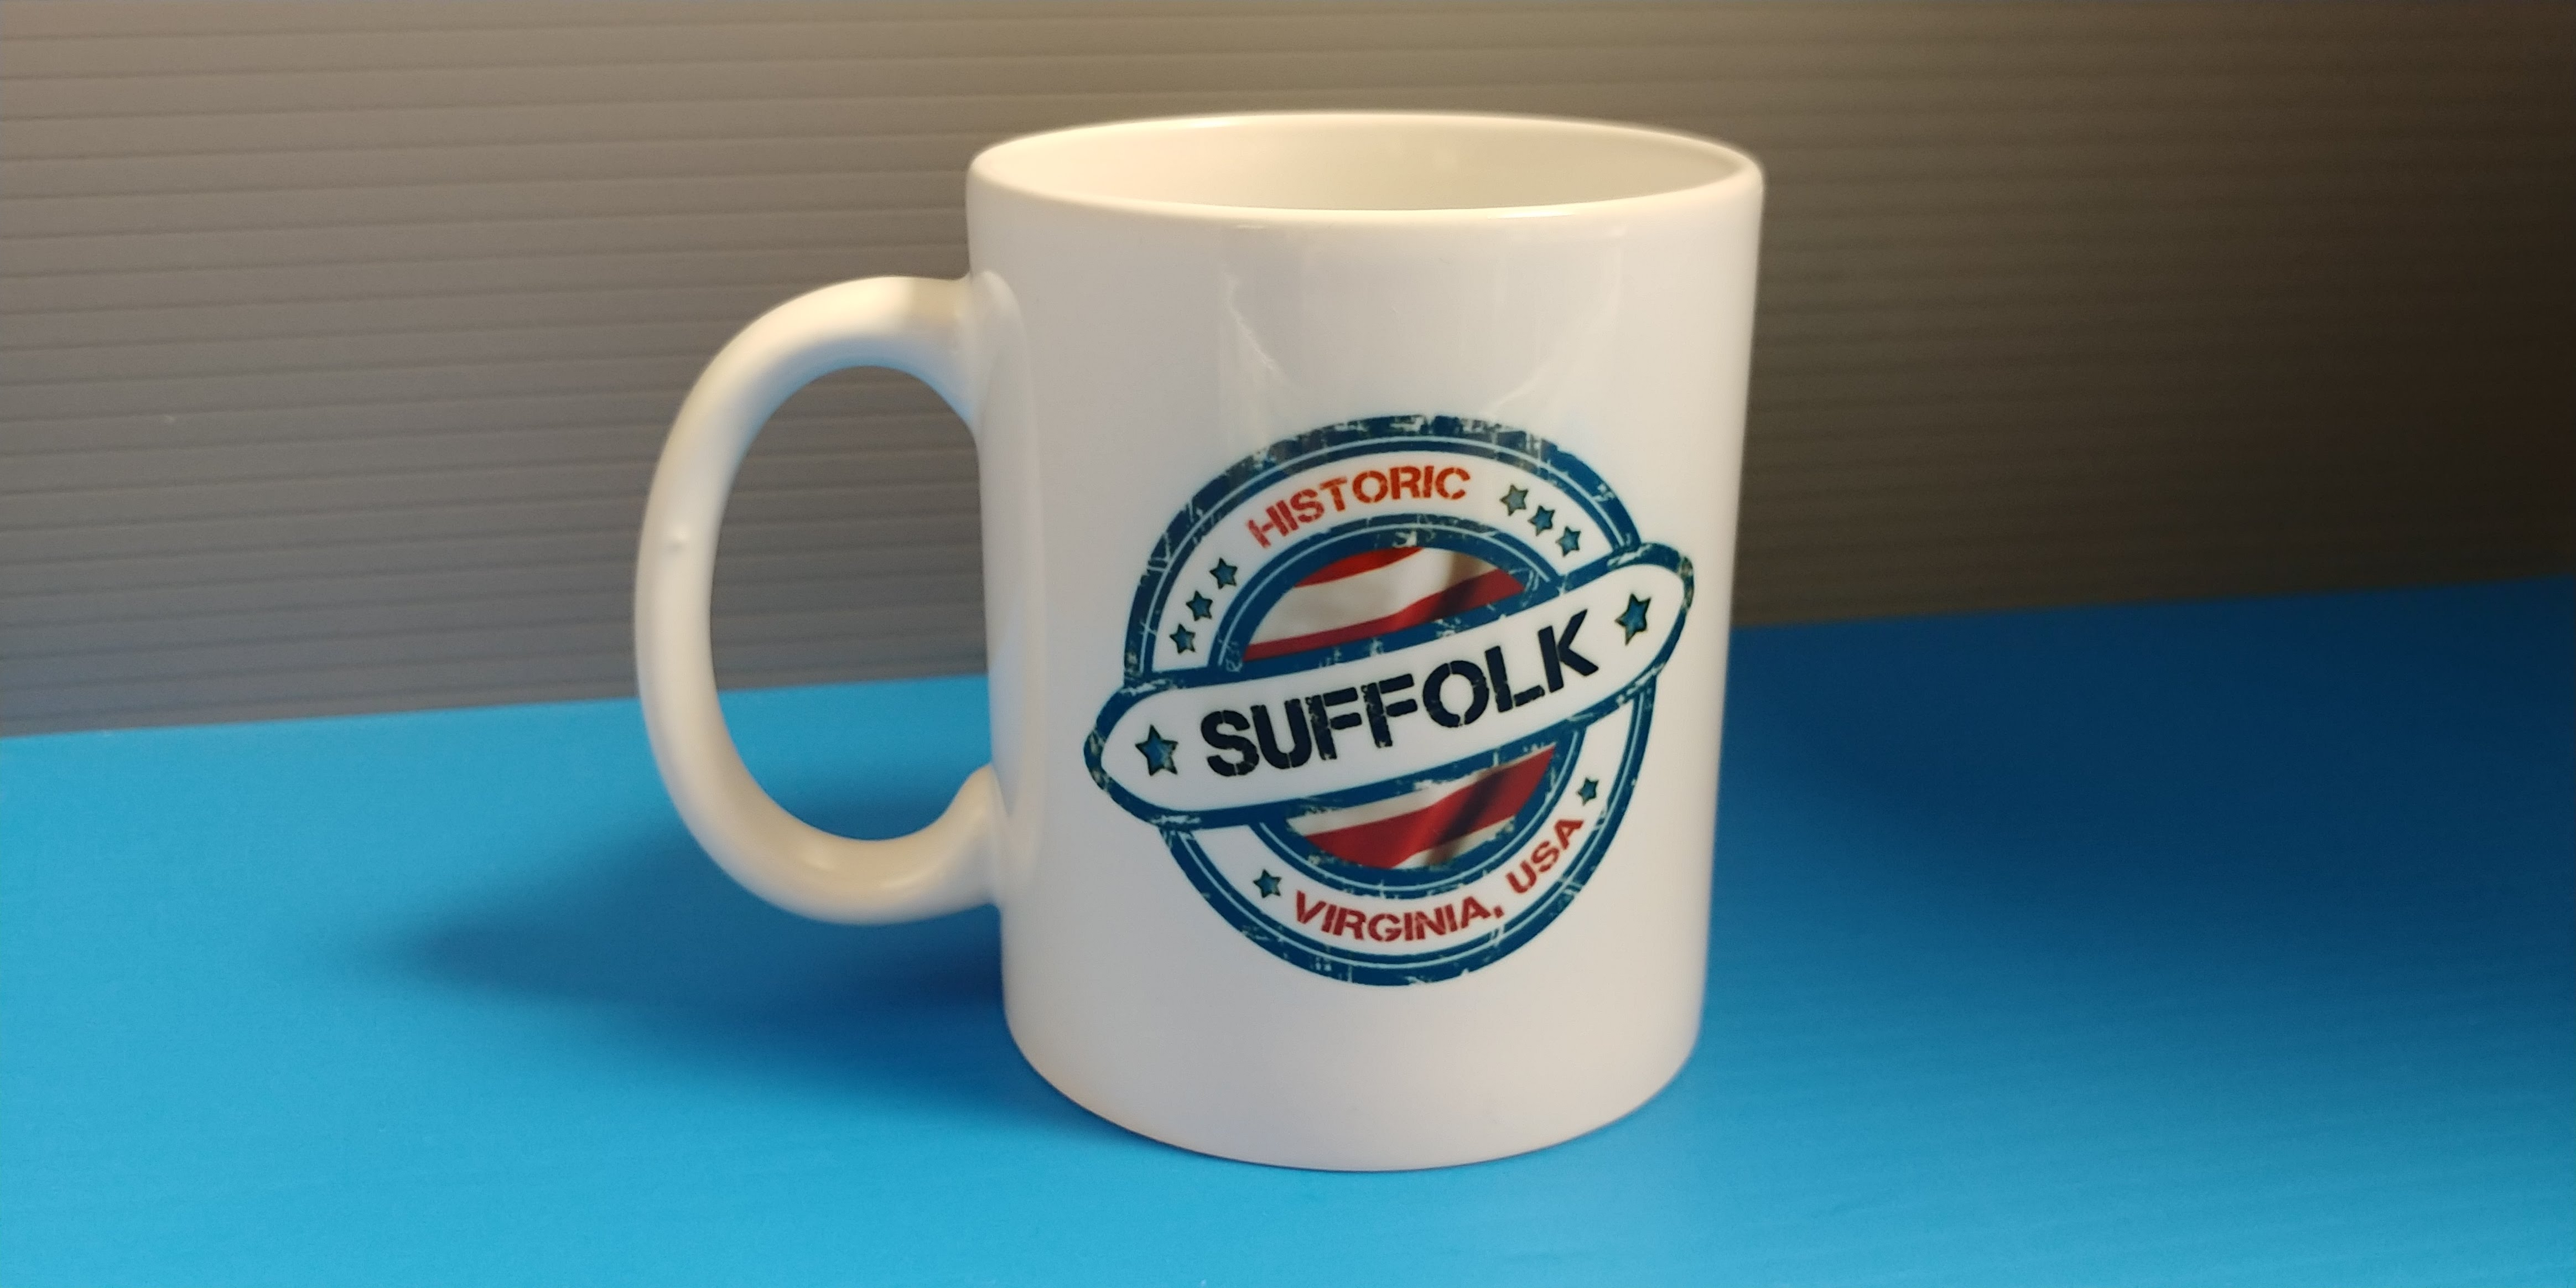 Historic Suffolk - 11oz Mug